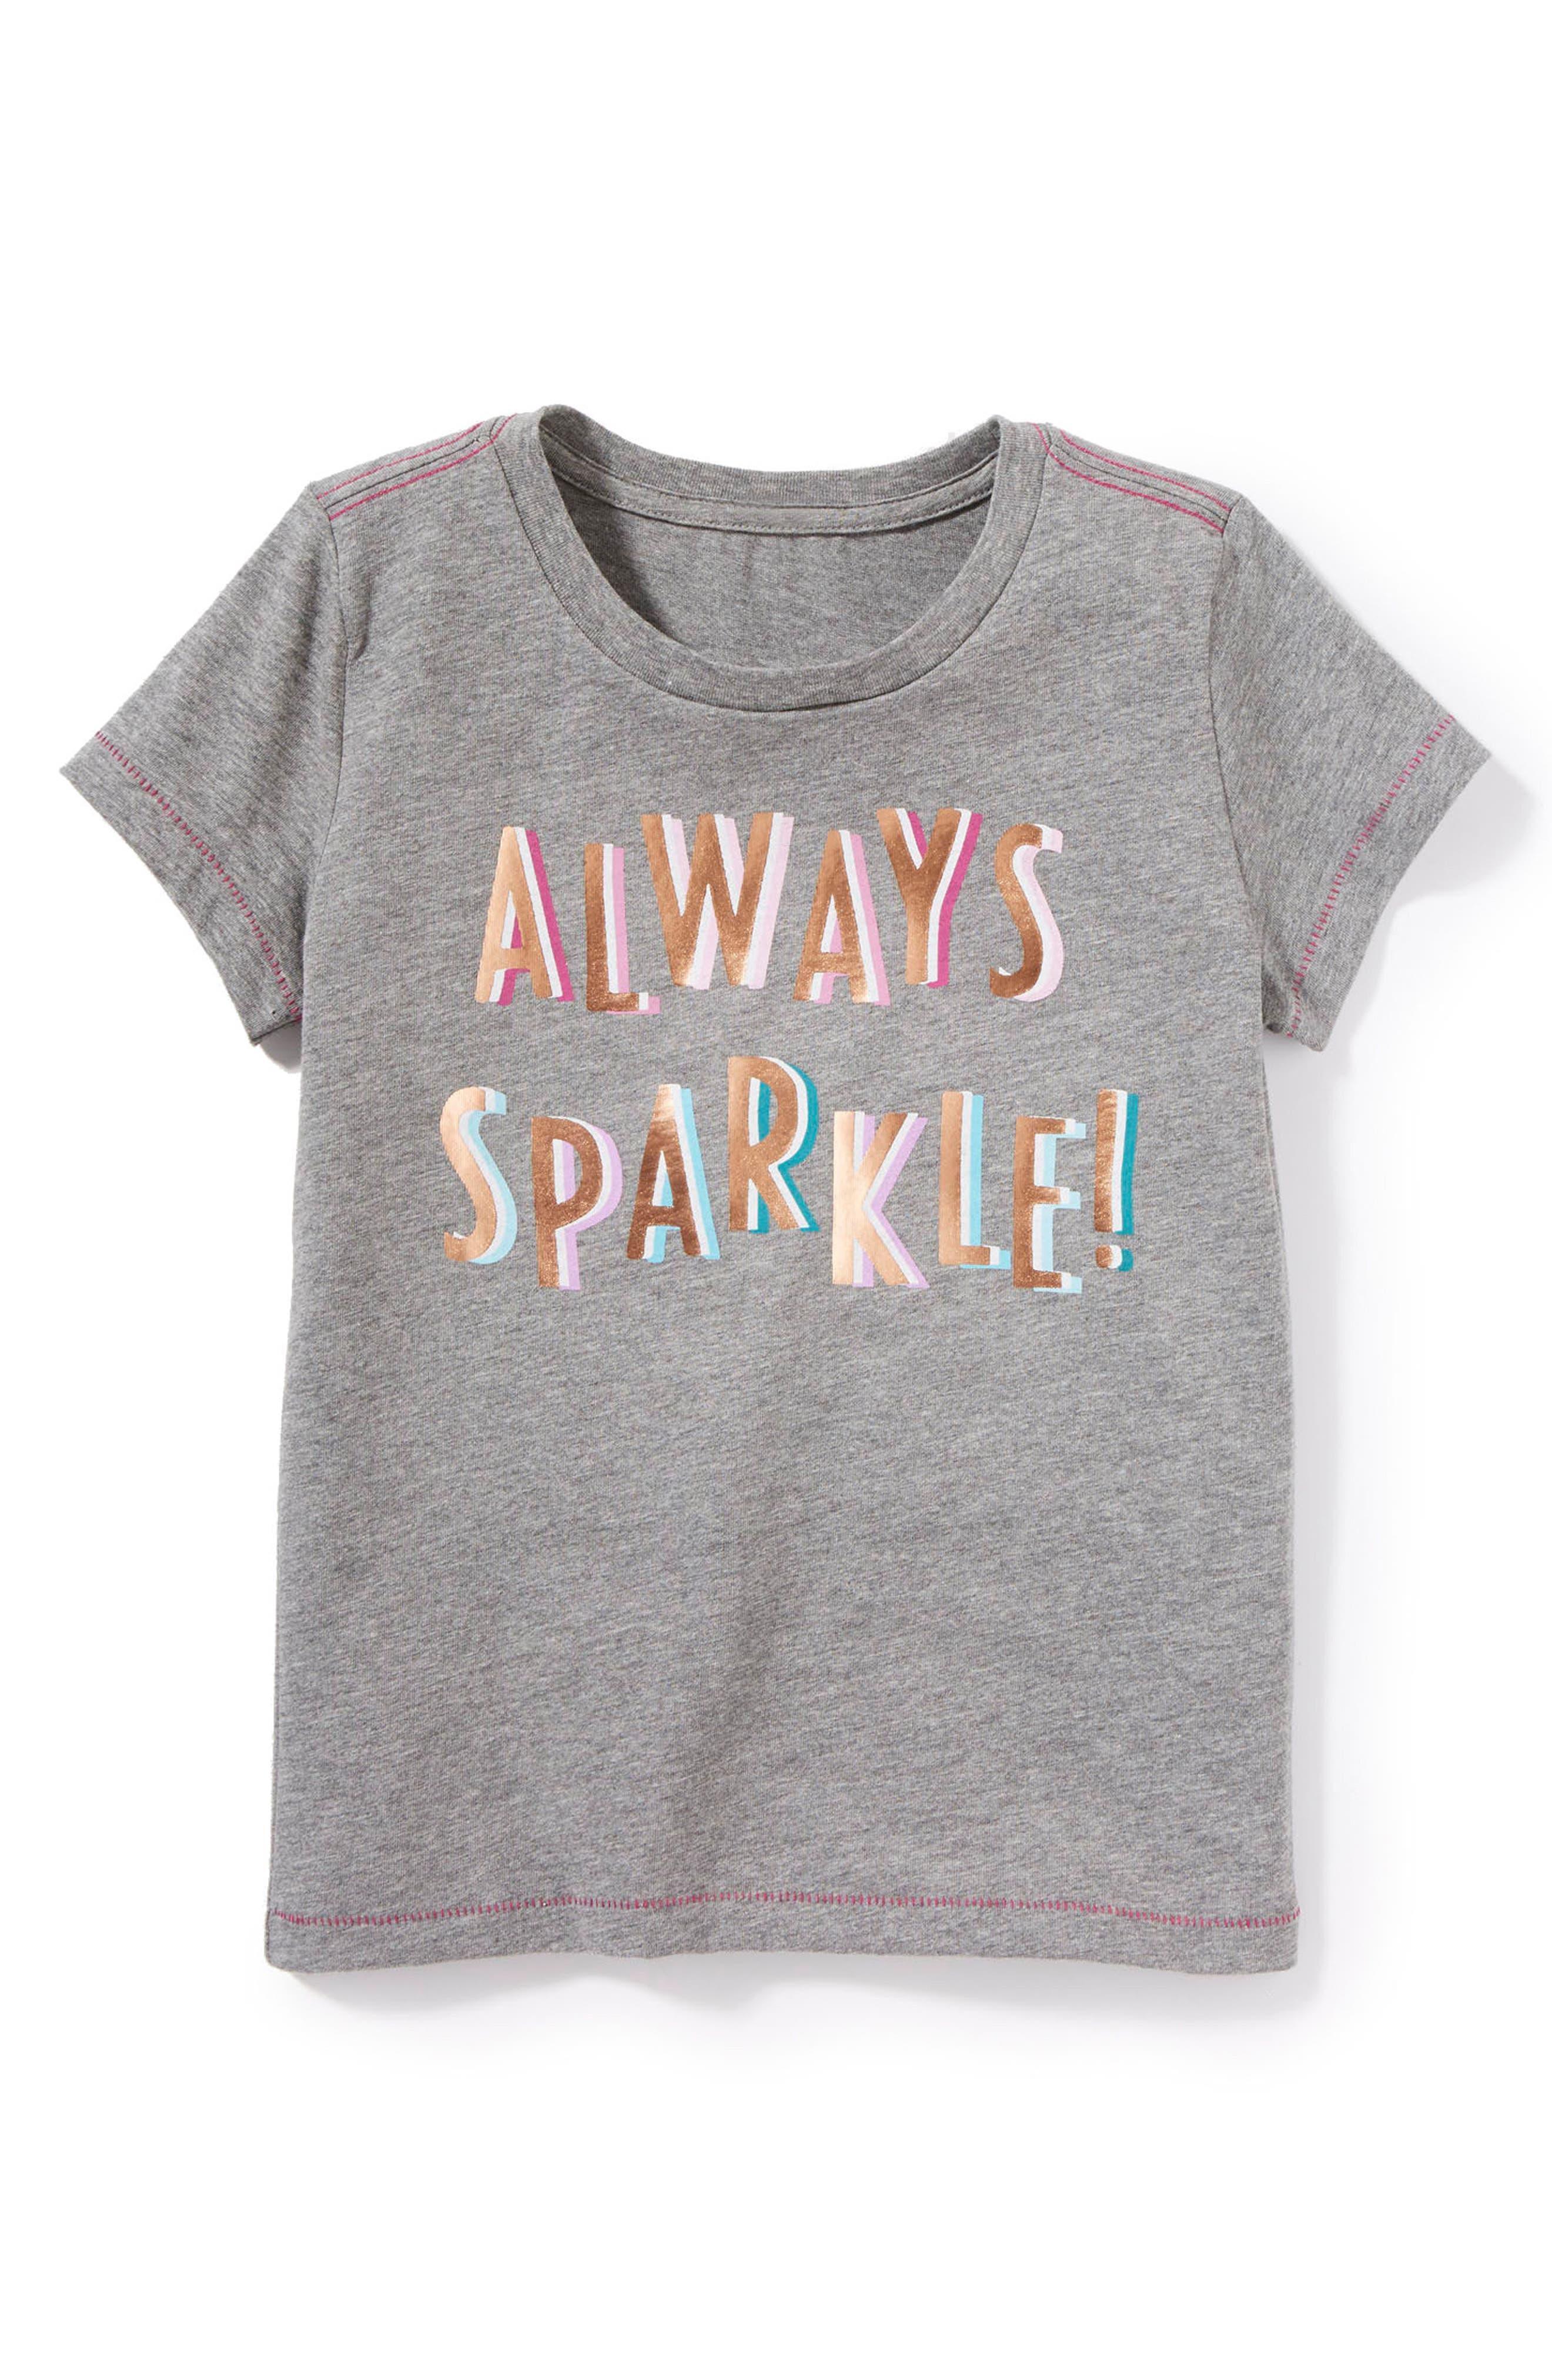 Alternate Image 1 Selected - Peek Always Sparkle Graphic Tee (Toddler Girls, Little Girls & Big Girls)